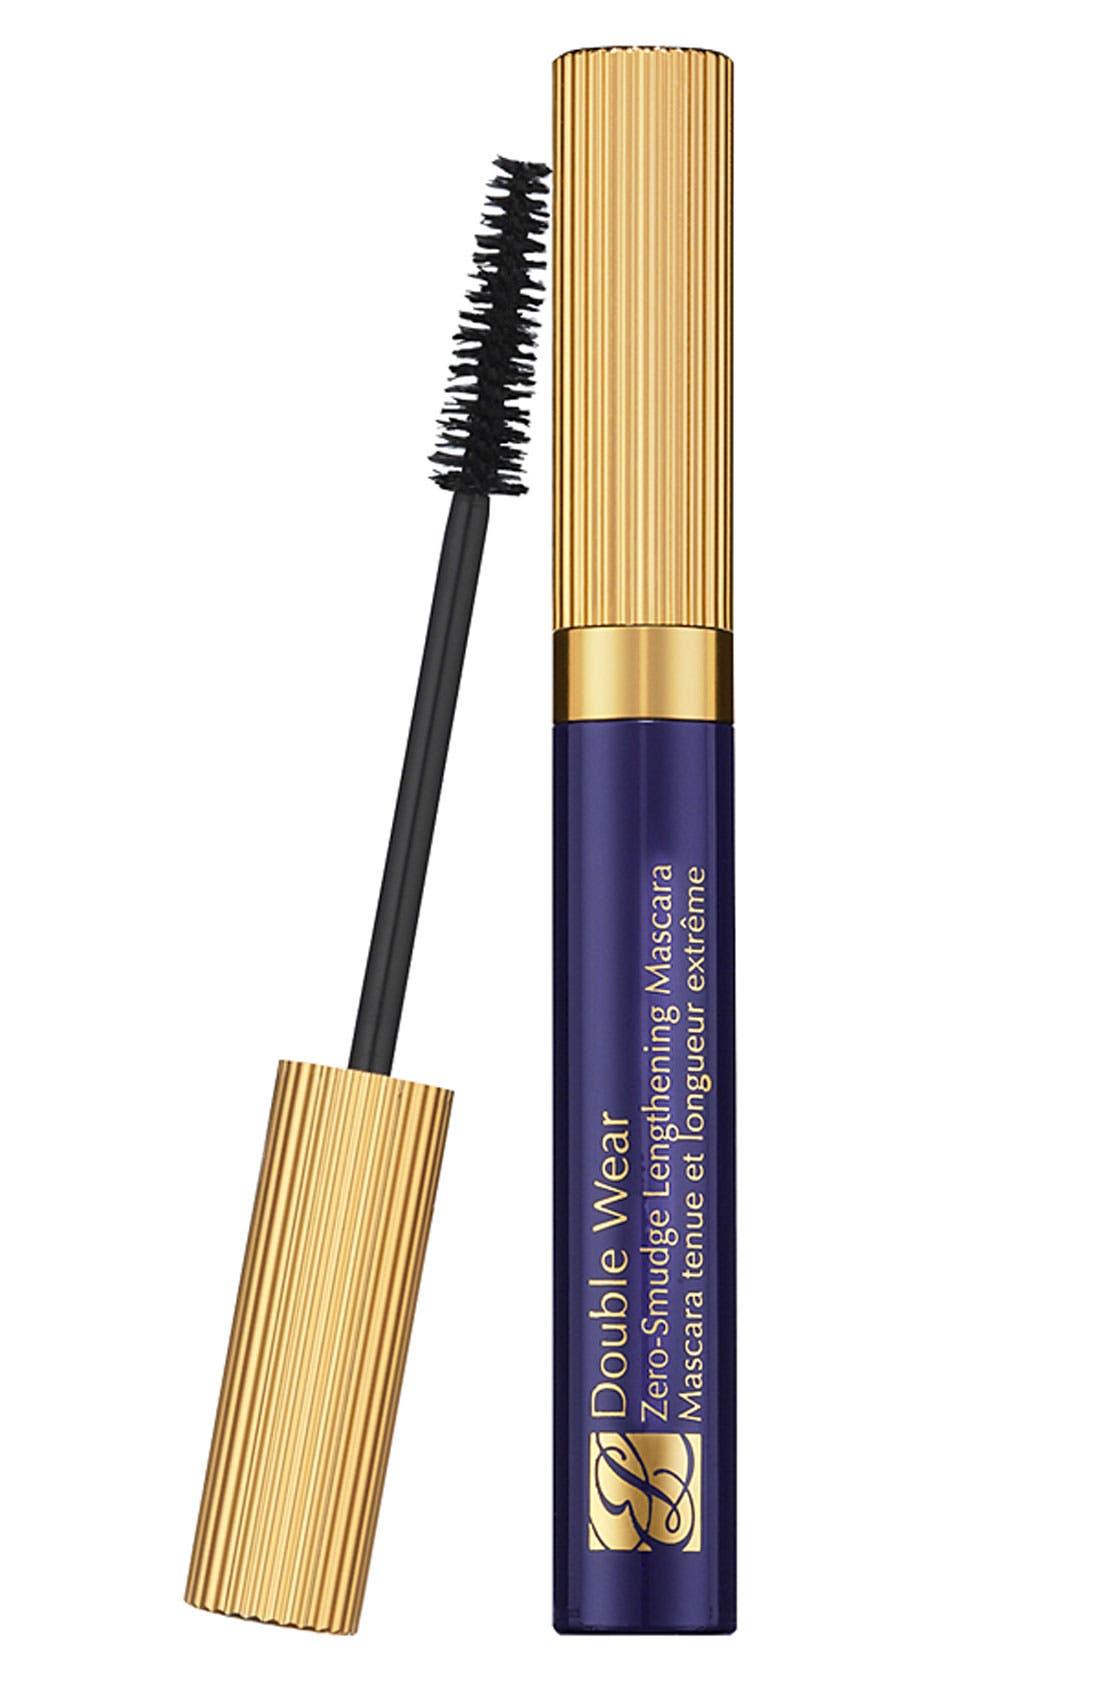 Double Wear Zero-Smudge Lengthening Mascara,                             Main thumbnail 1, color,                             BLACK